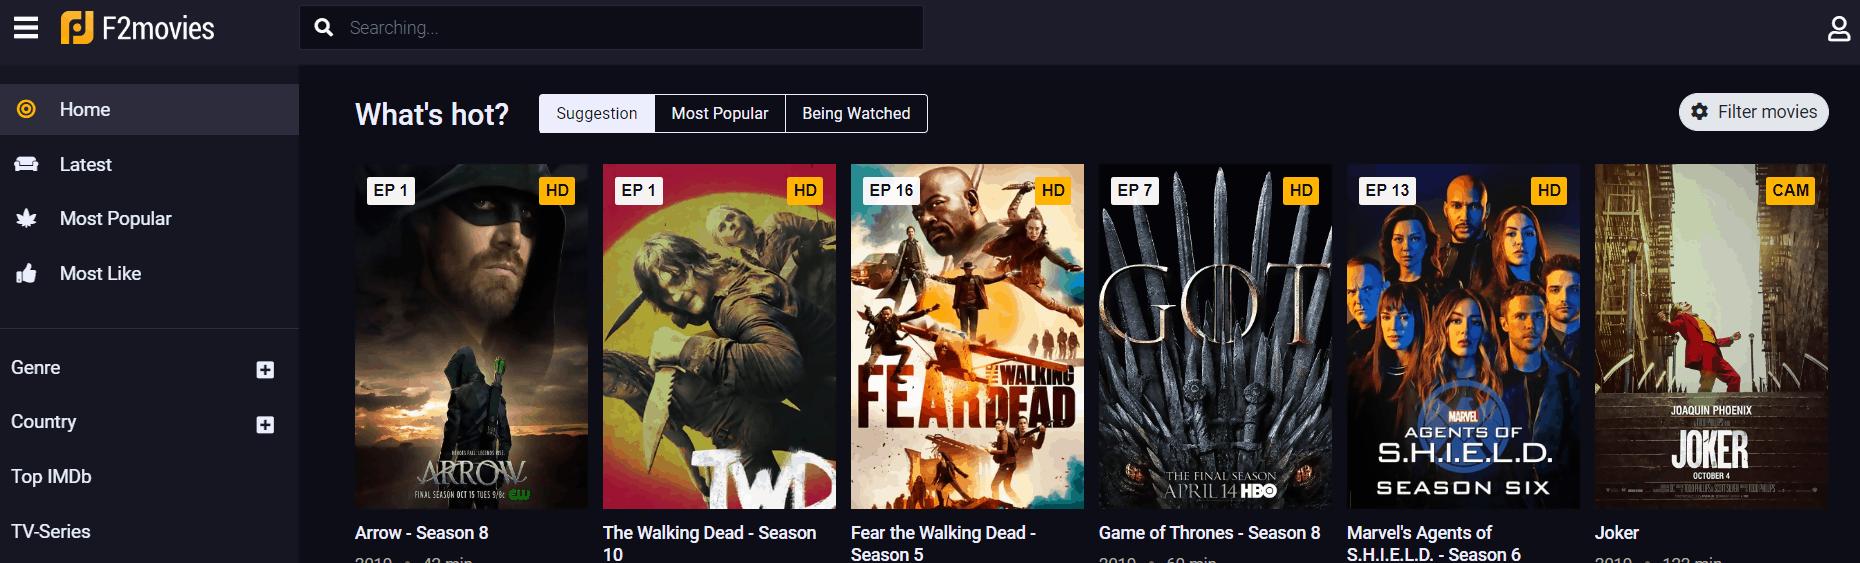 F2 Movies